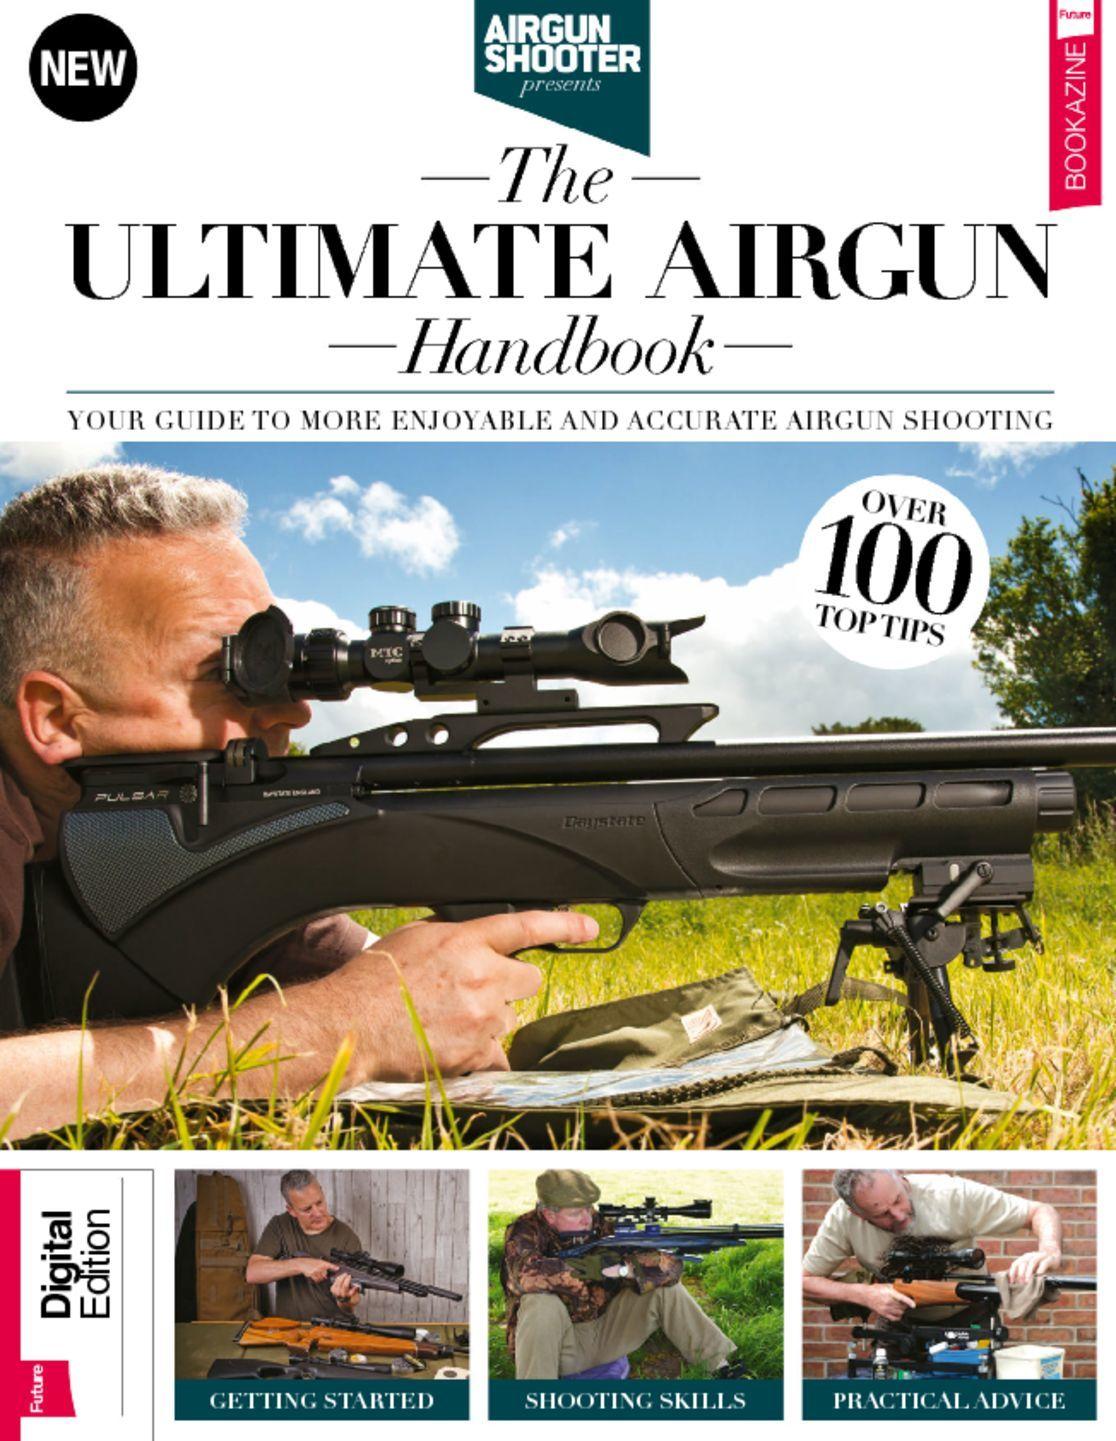 Airgun Shooter presents The Ultimate Airgun Handbook Digital